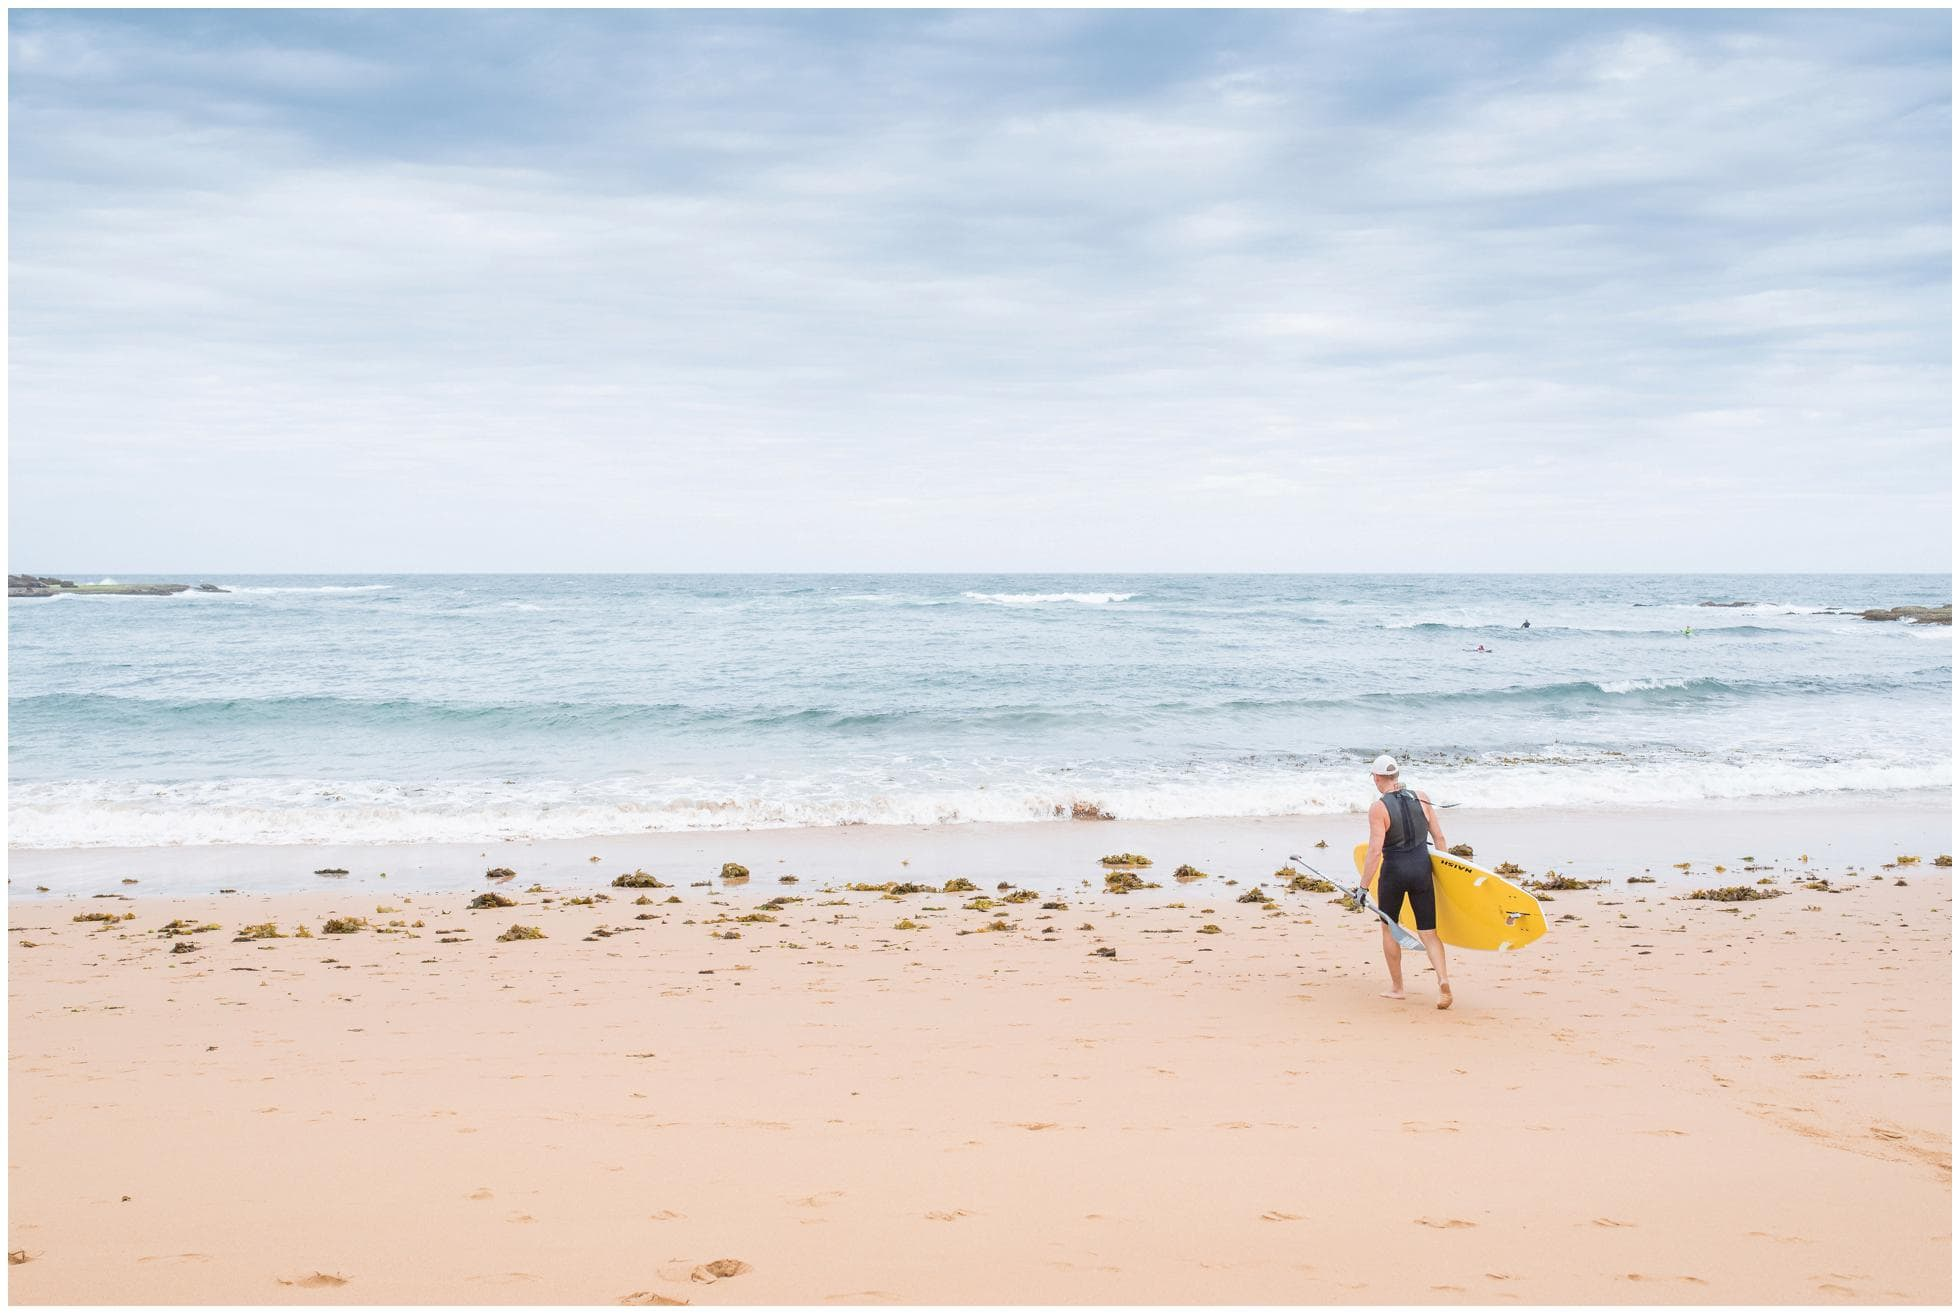 Surfer dude because it's Australia